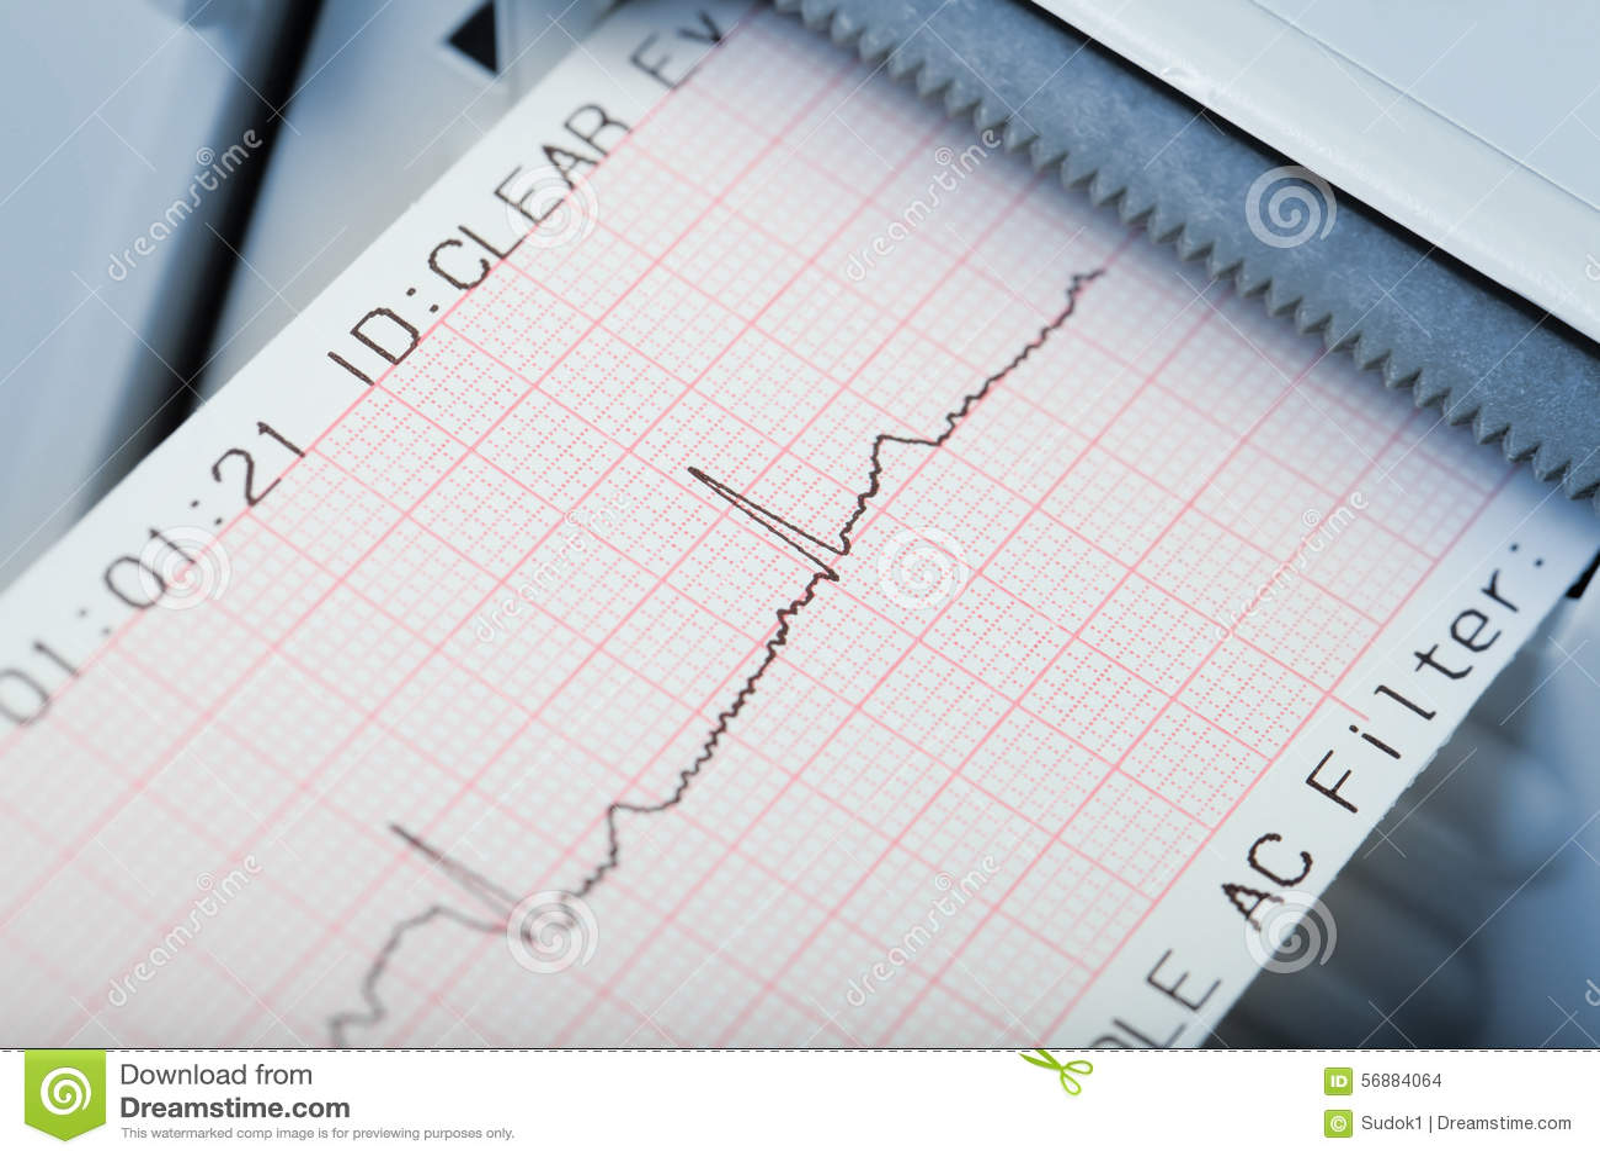 Diagnosi rapida dei disordini cardiaci di ritmo Macro foto